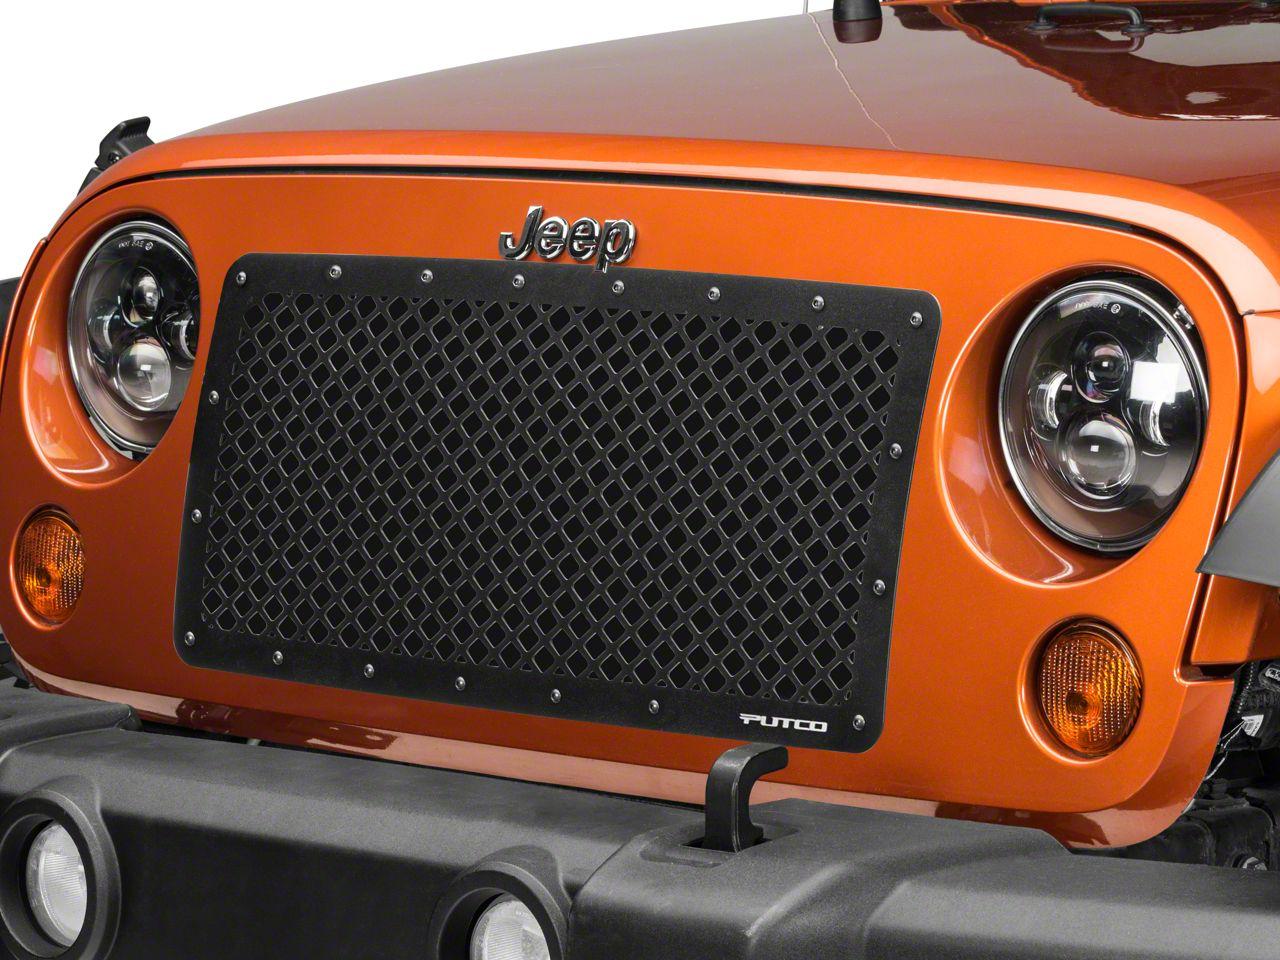 Putco Designer FX Replacement Grille - Black (07-18 Jeep Wrangler JK)